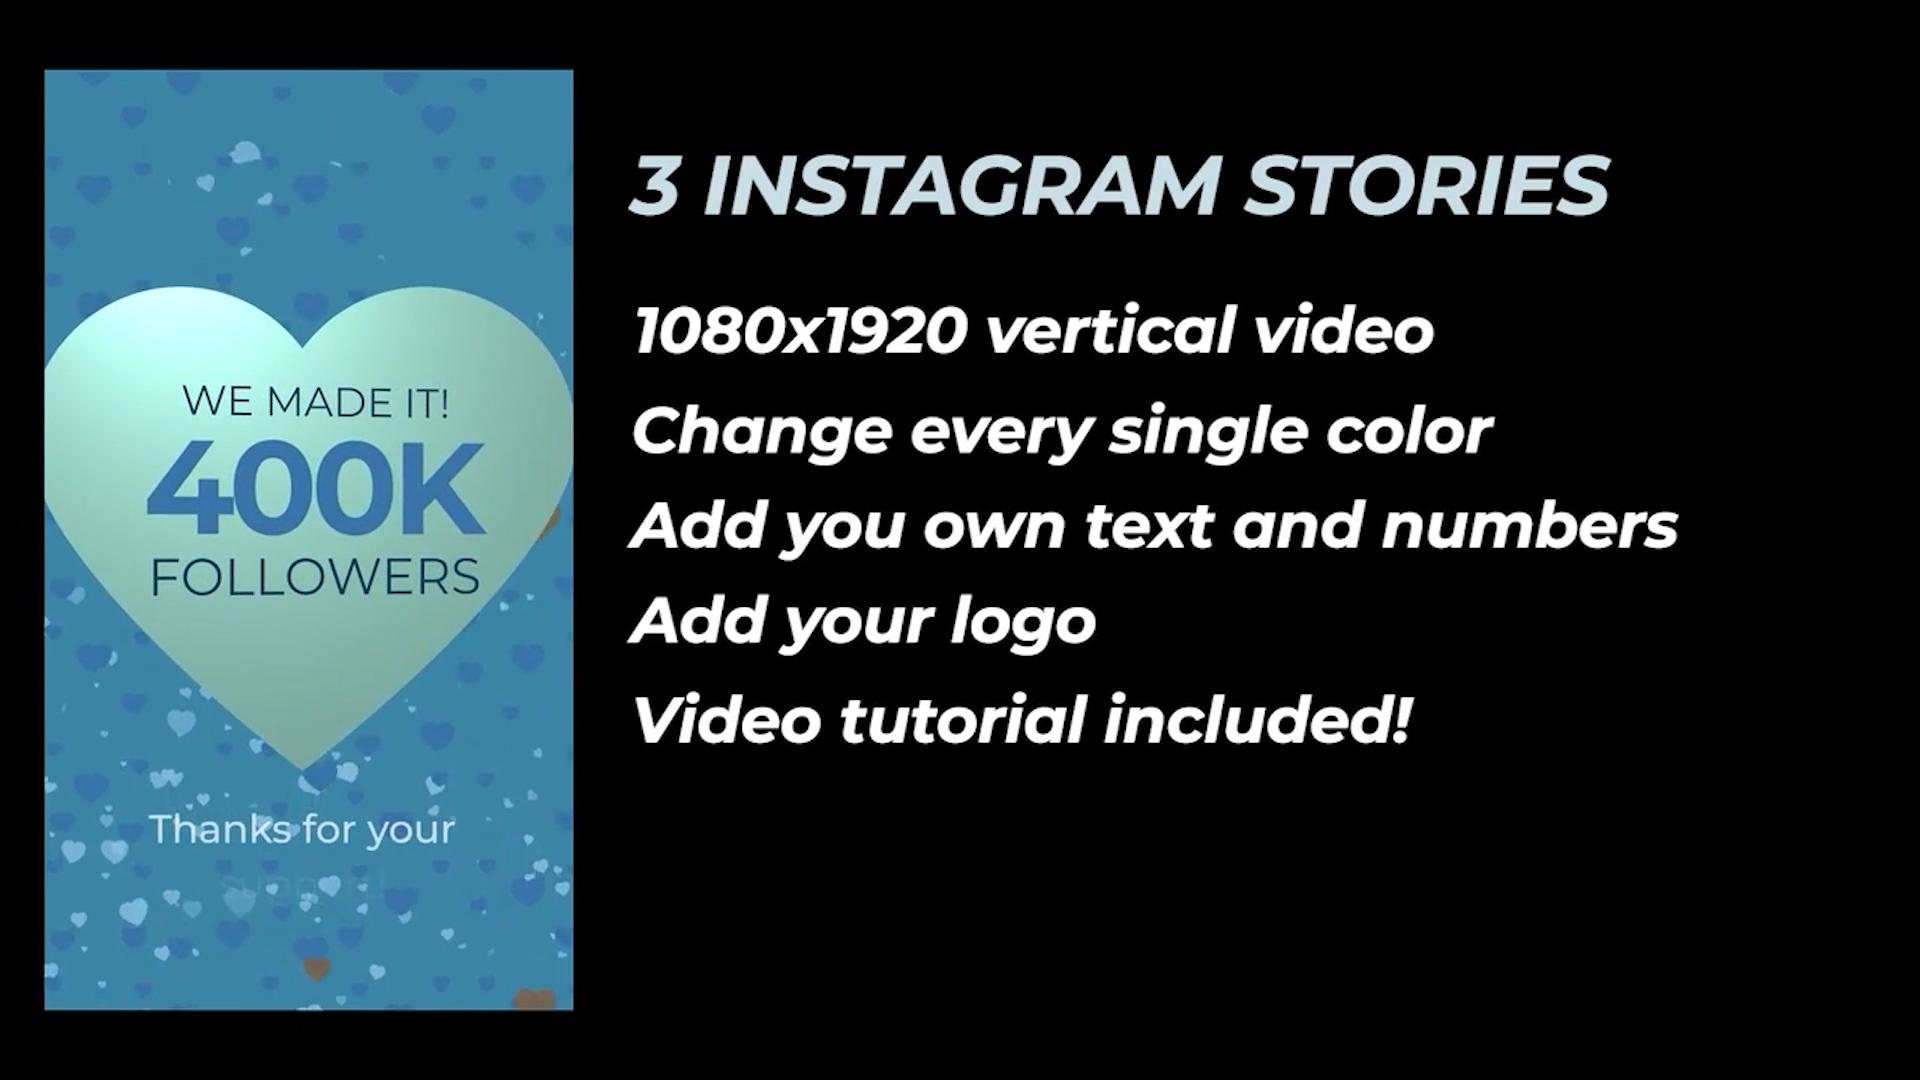 400K Followers Stories - 3